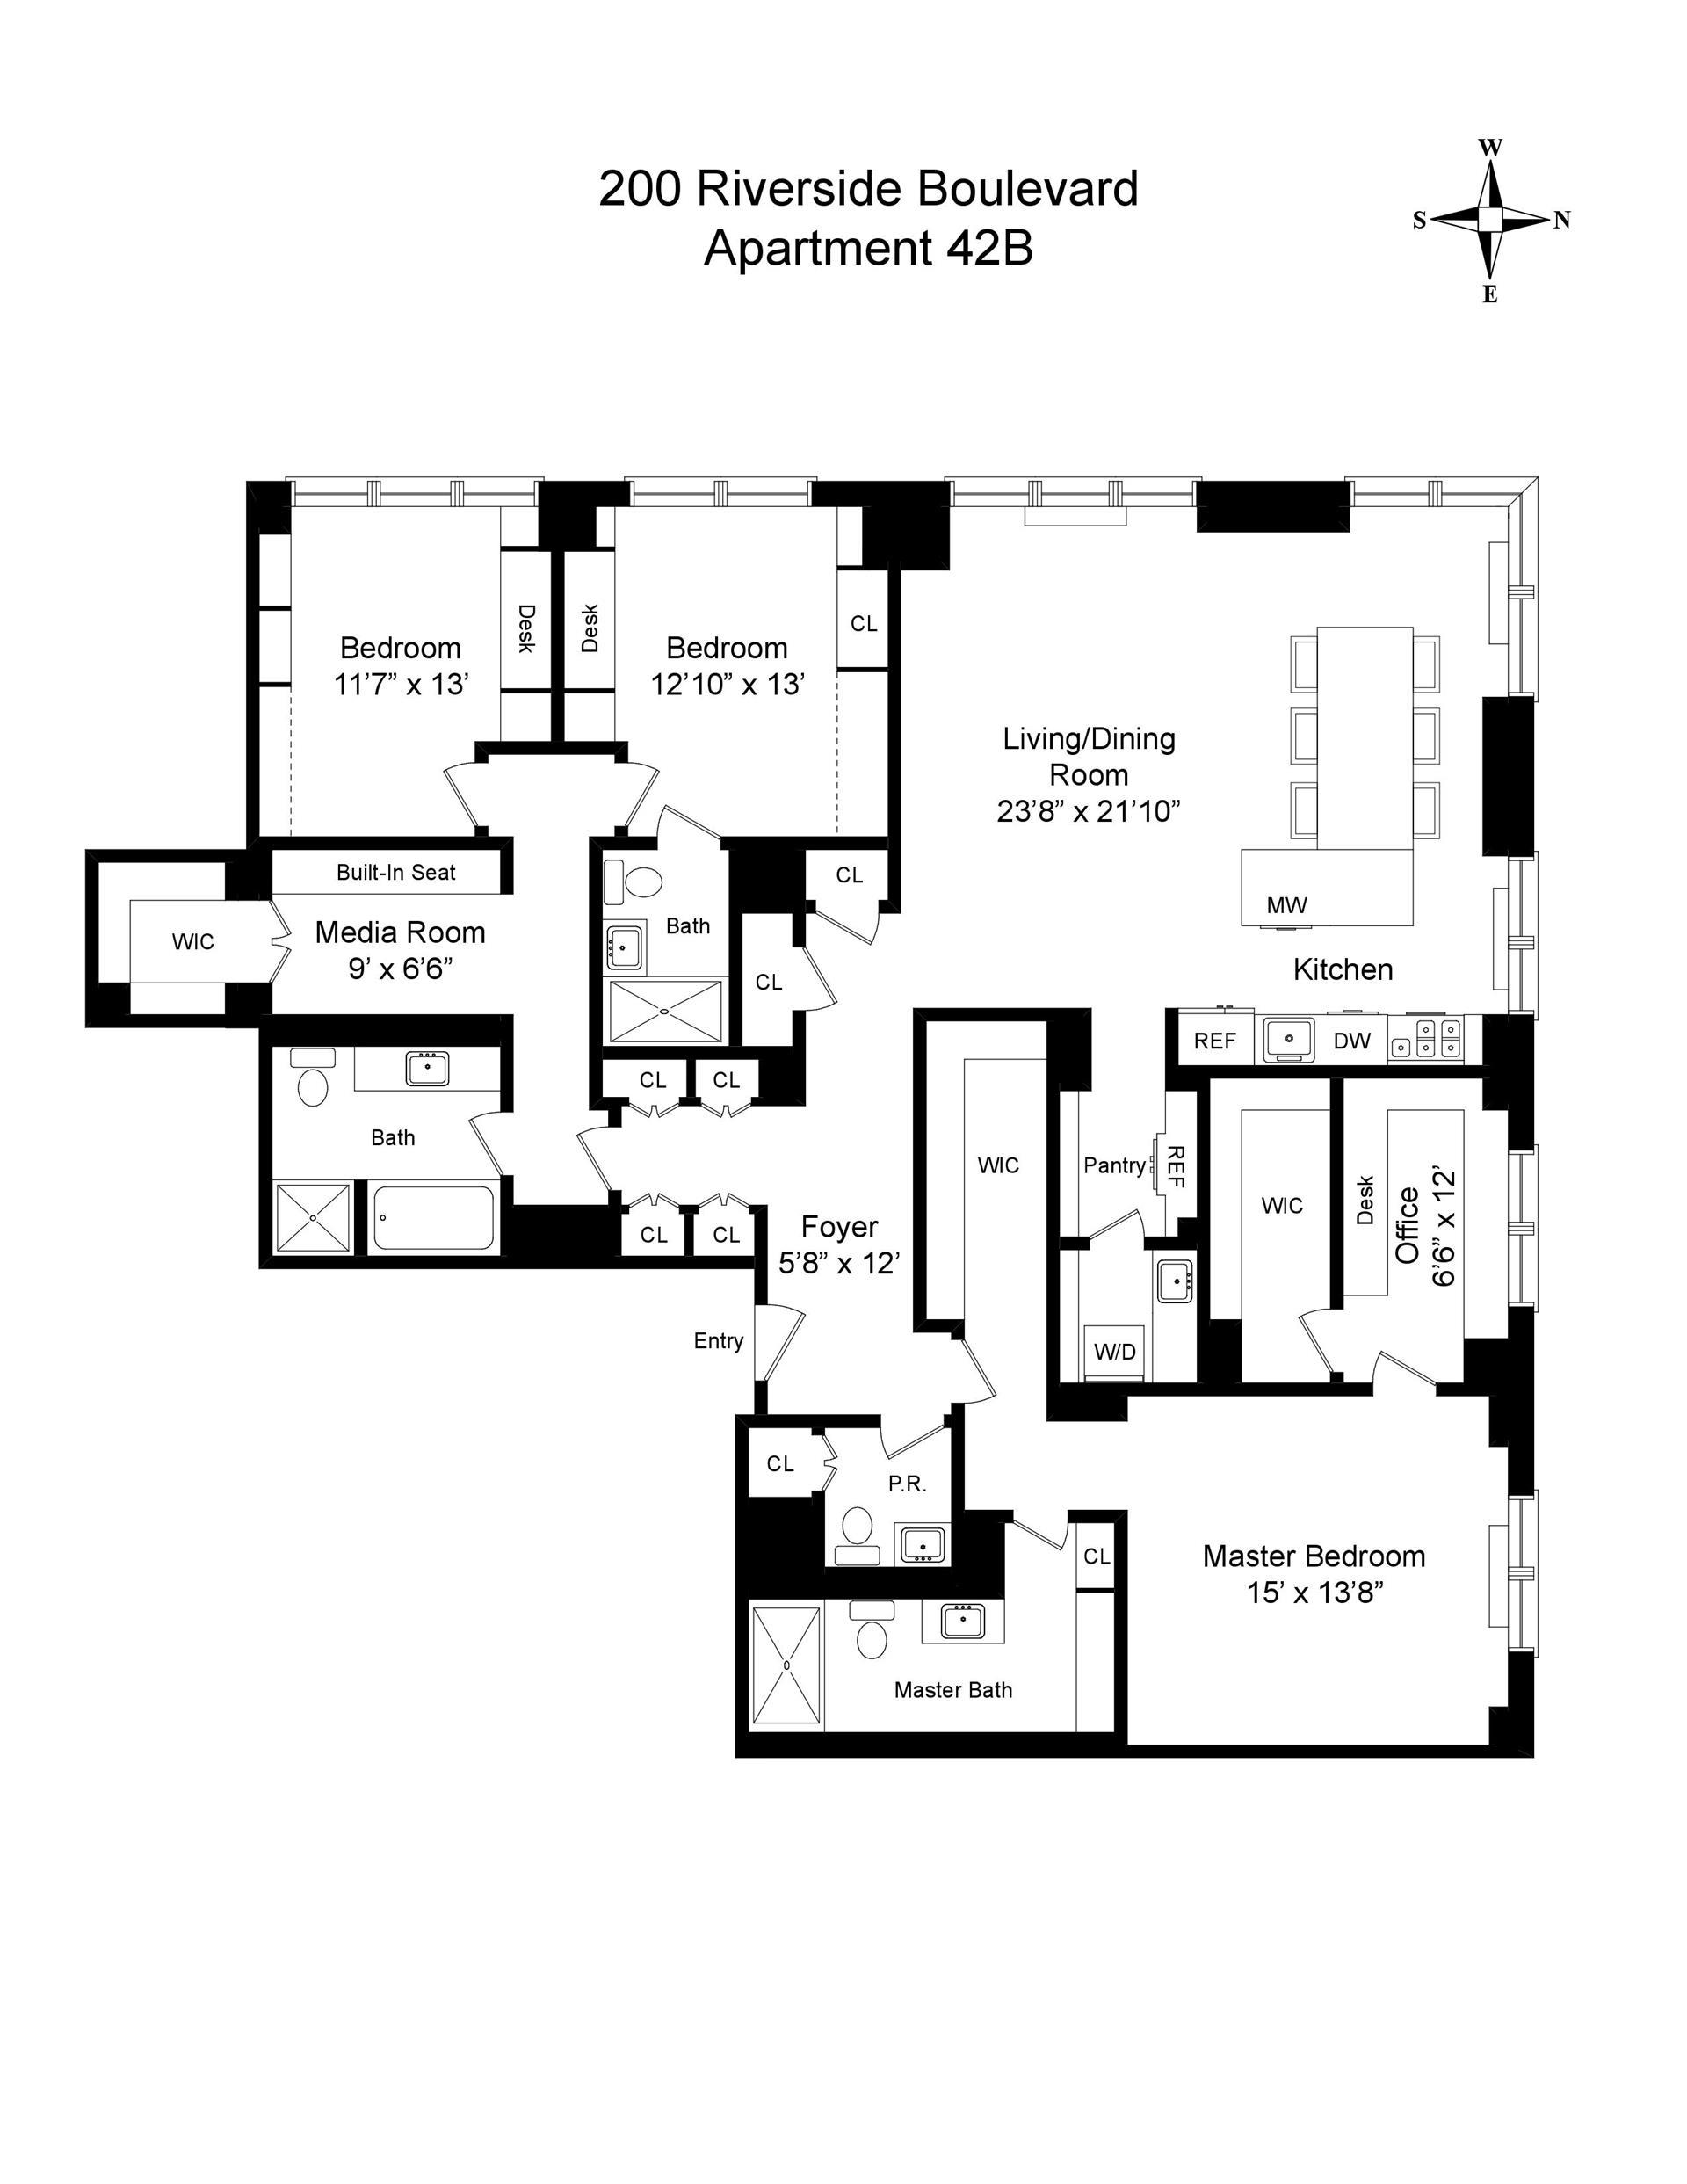 Floor plan of 200 Riverside Boulevard, 42B - Upper West Side, New York